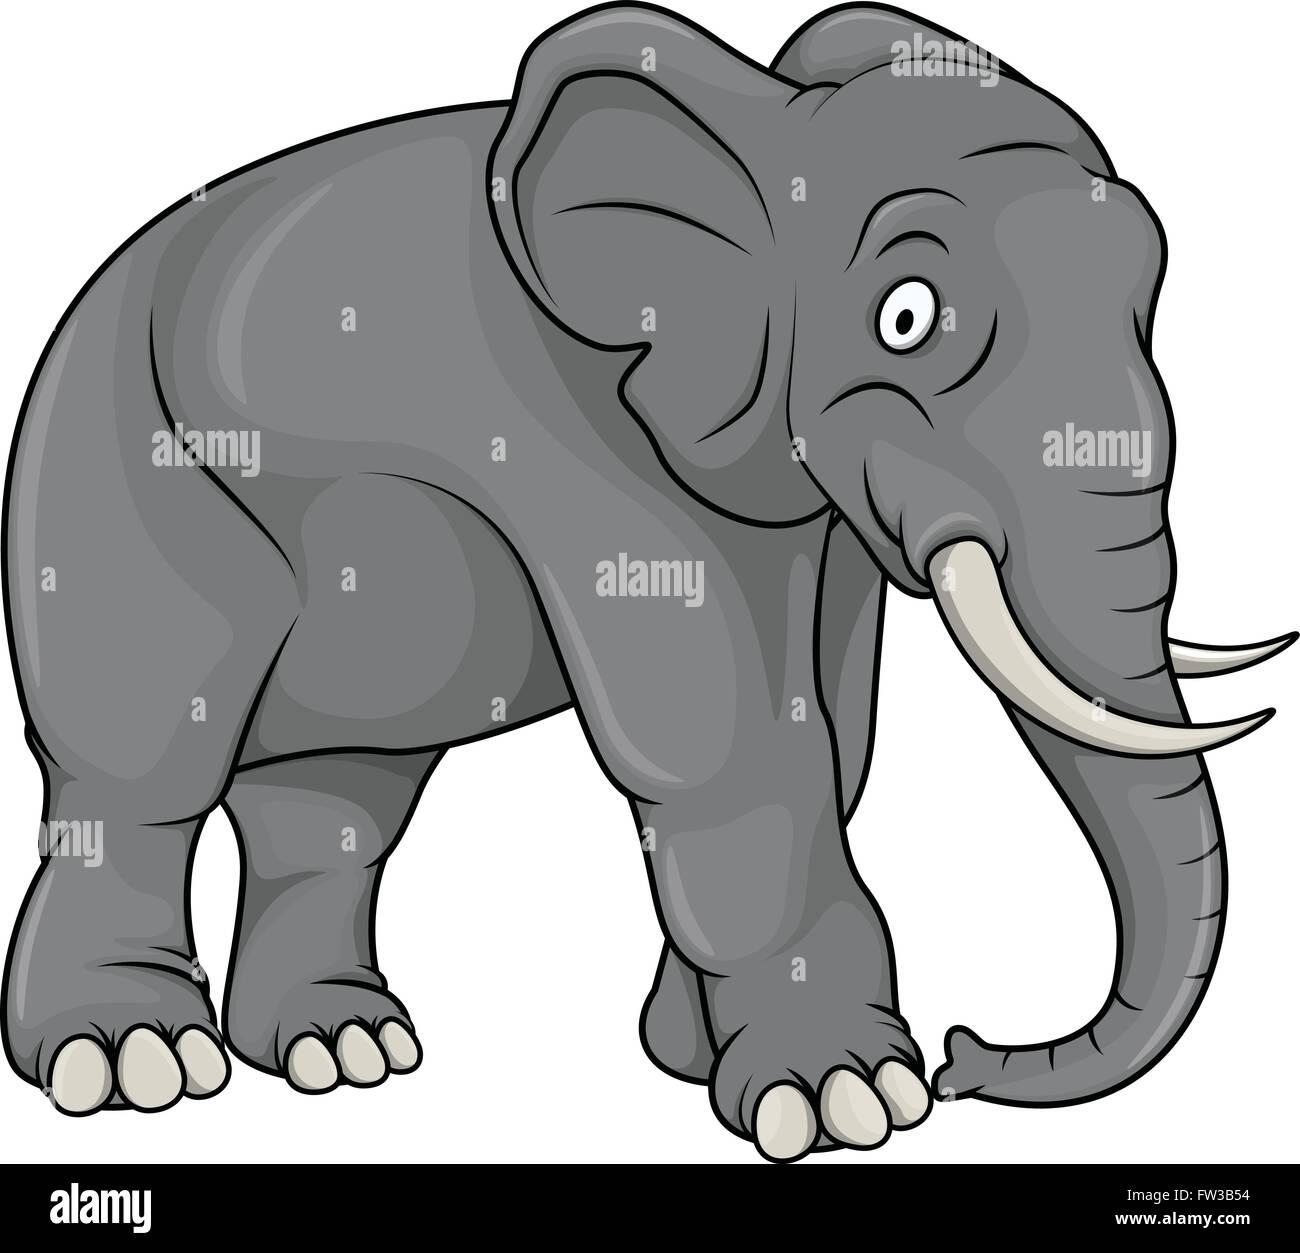 elefanten comic illustration vektor abbildung bild 101492864 alamy. Black Bedroom Furniture Sets. Home Design Ideas